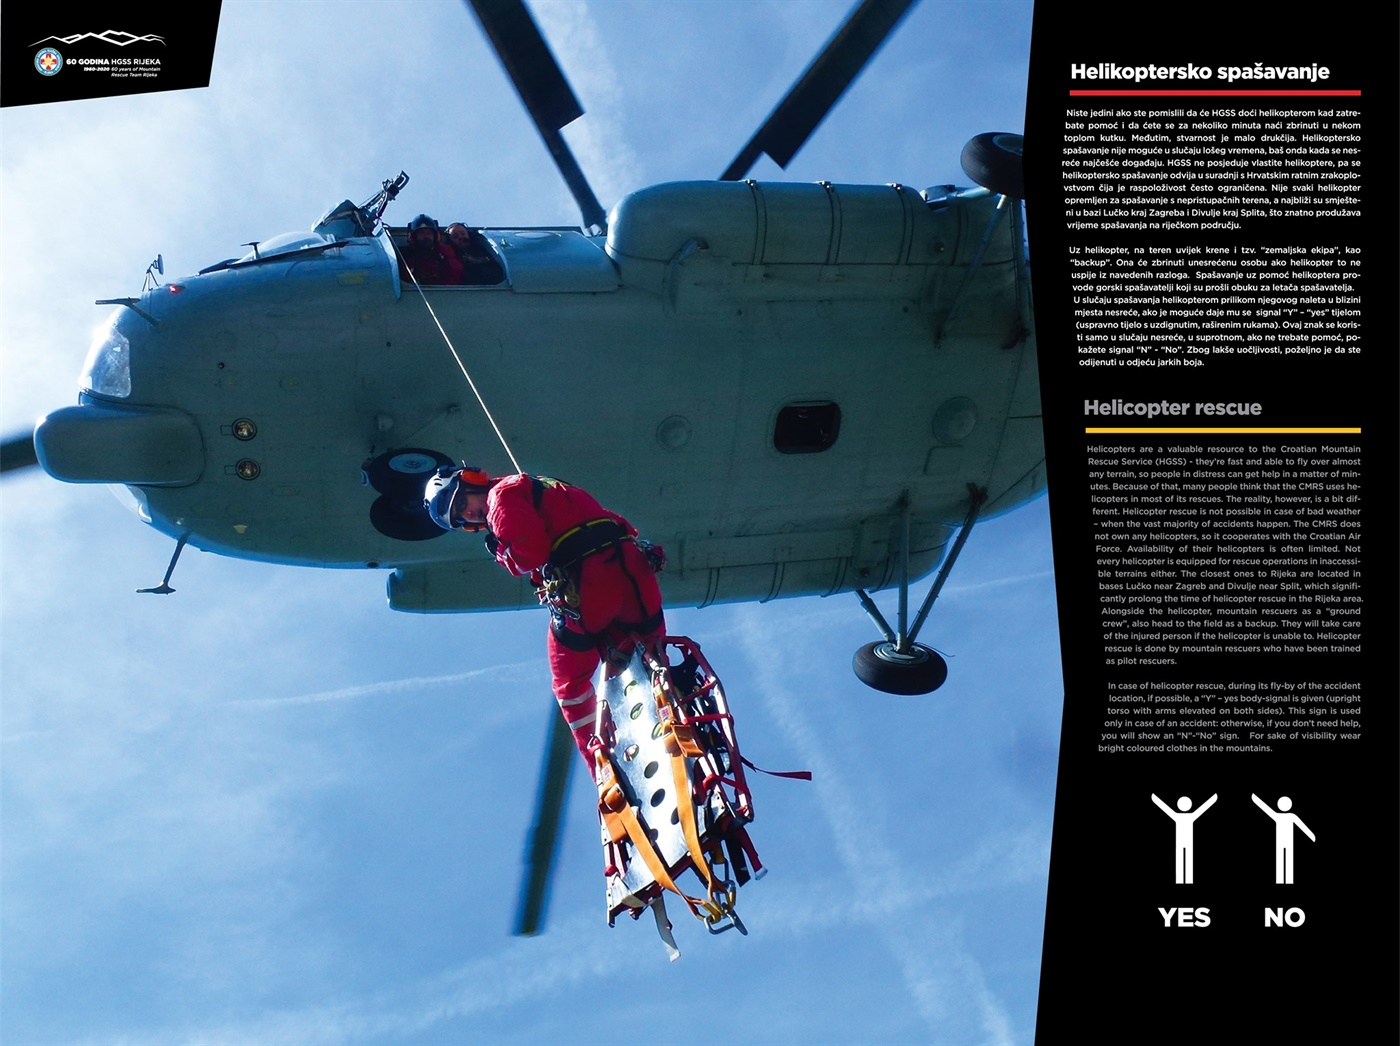 Helikoptersko spašavanje (60 god. HGSS Rijeka - plakat 15/18)